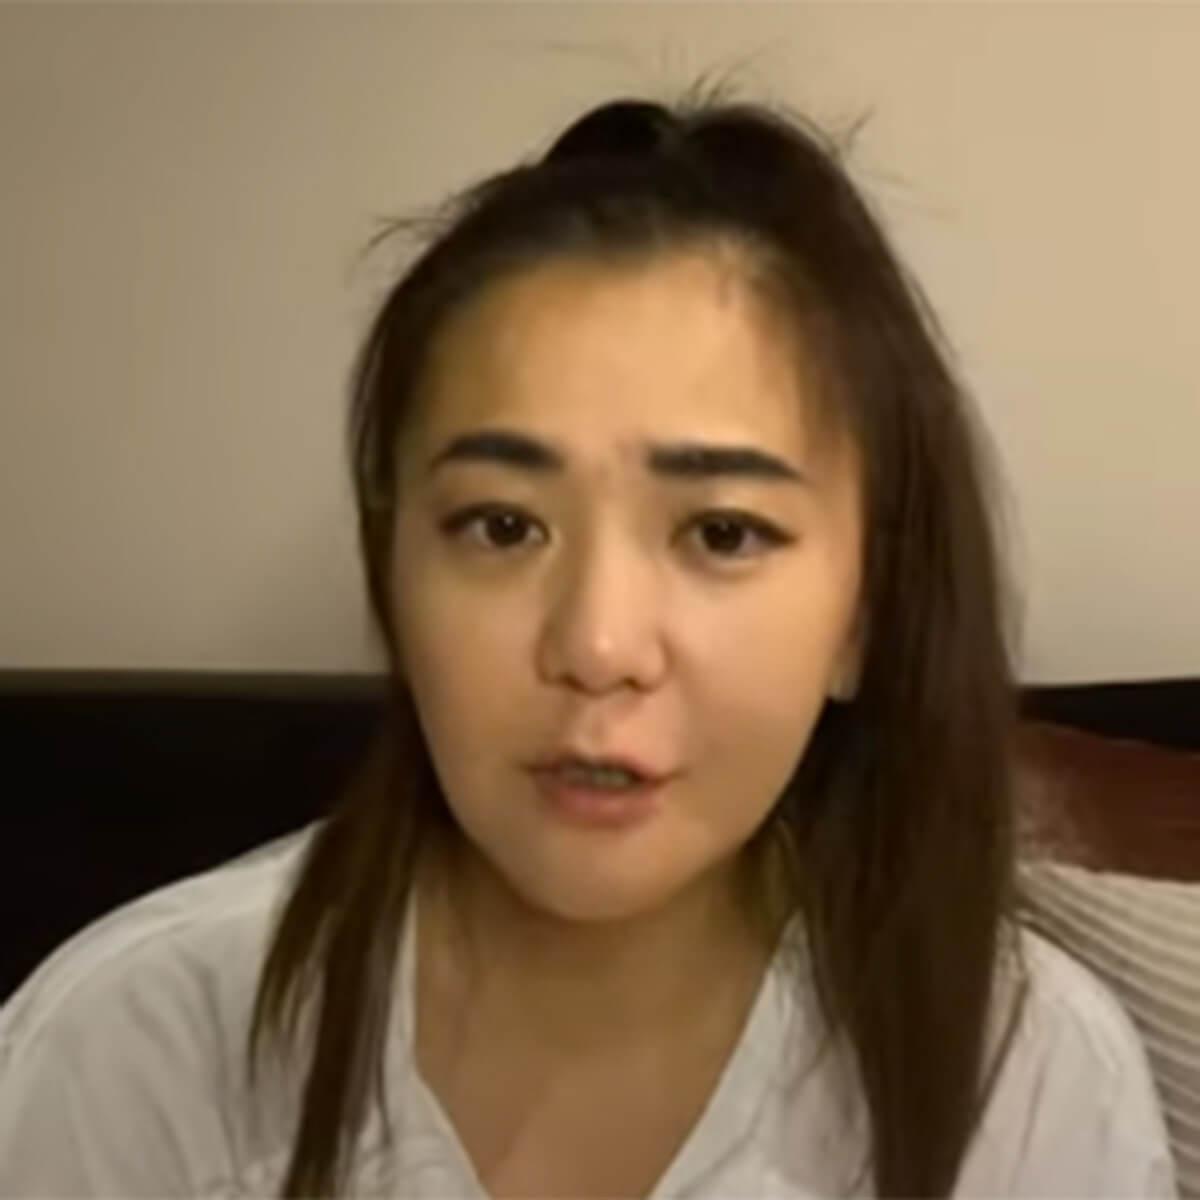 test ツイッターメディア - 華原朋美、YouTube開設も「生気がない表情」に心配の声……救急搬送後の「10年前と同じような状態」とマスコミ騒然 | ガールズちゃんねる - Girls Channel - https://t.co/kaBG7wNKrN https://t.co/cWiZz57Z5y